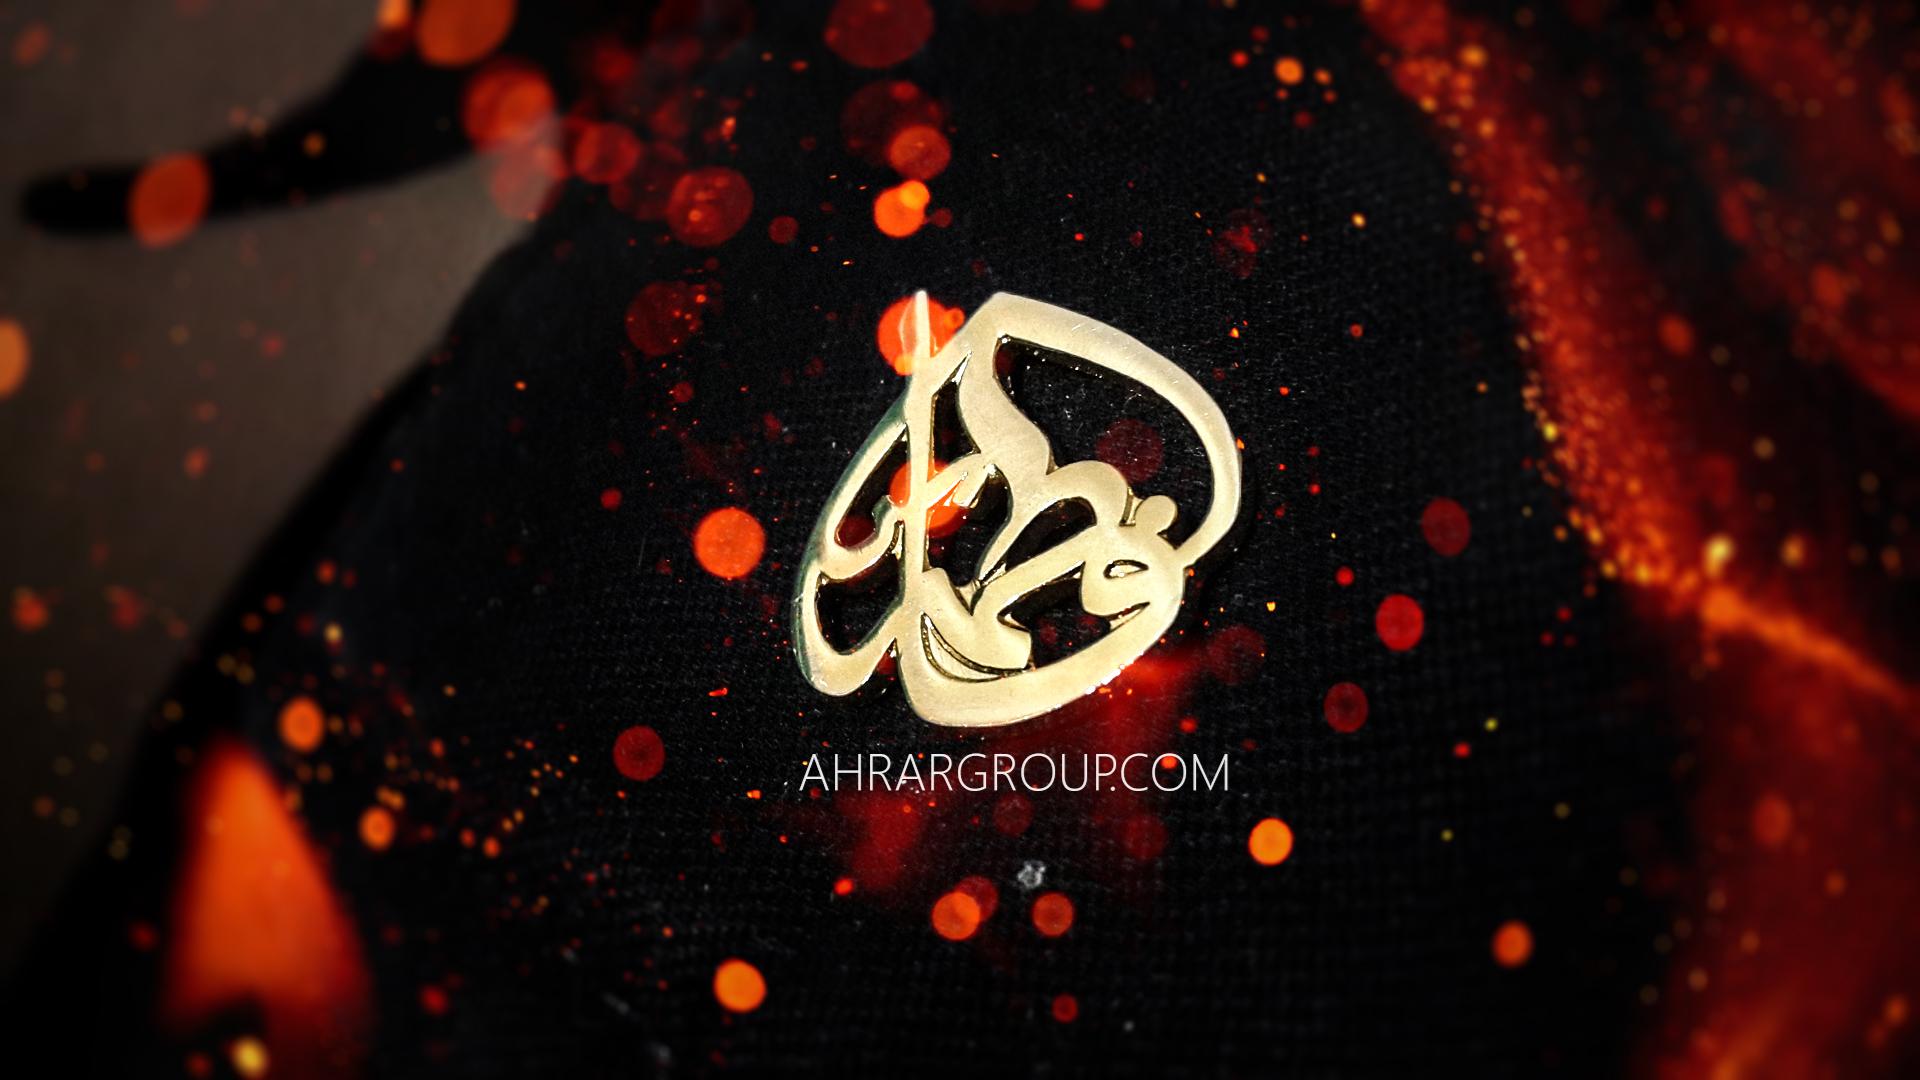 ahrargroup-190